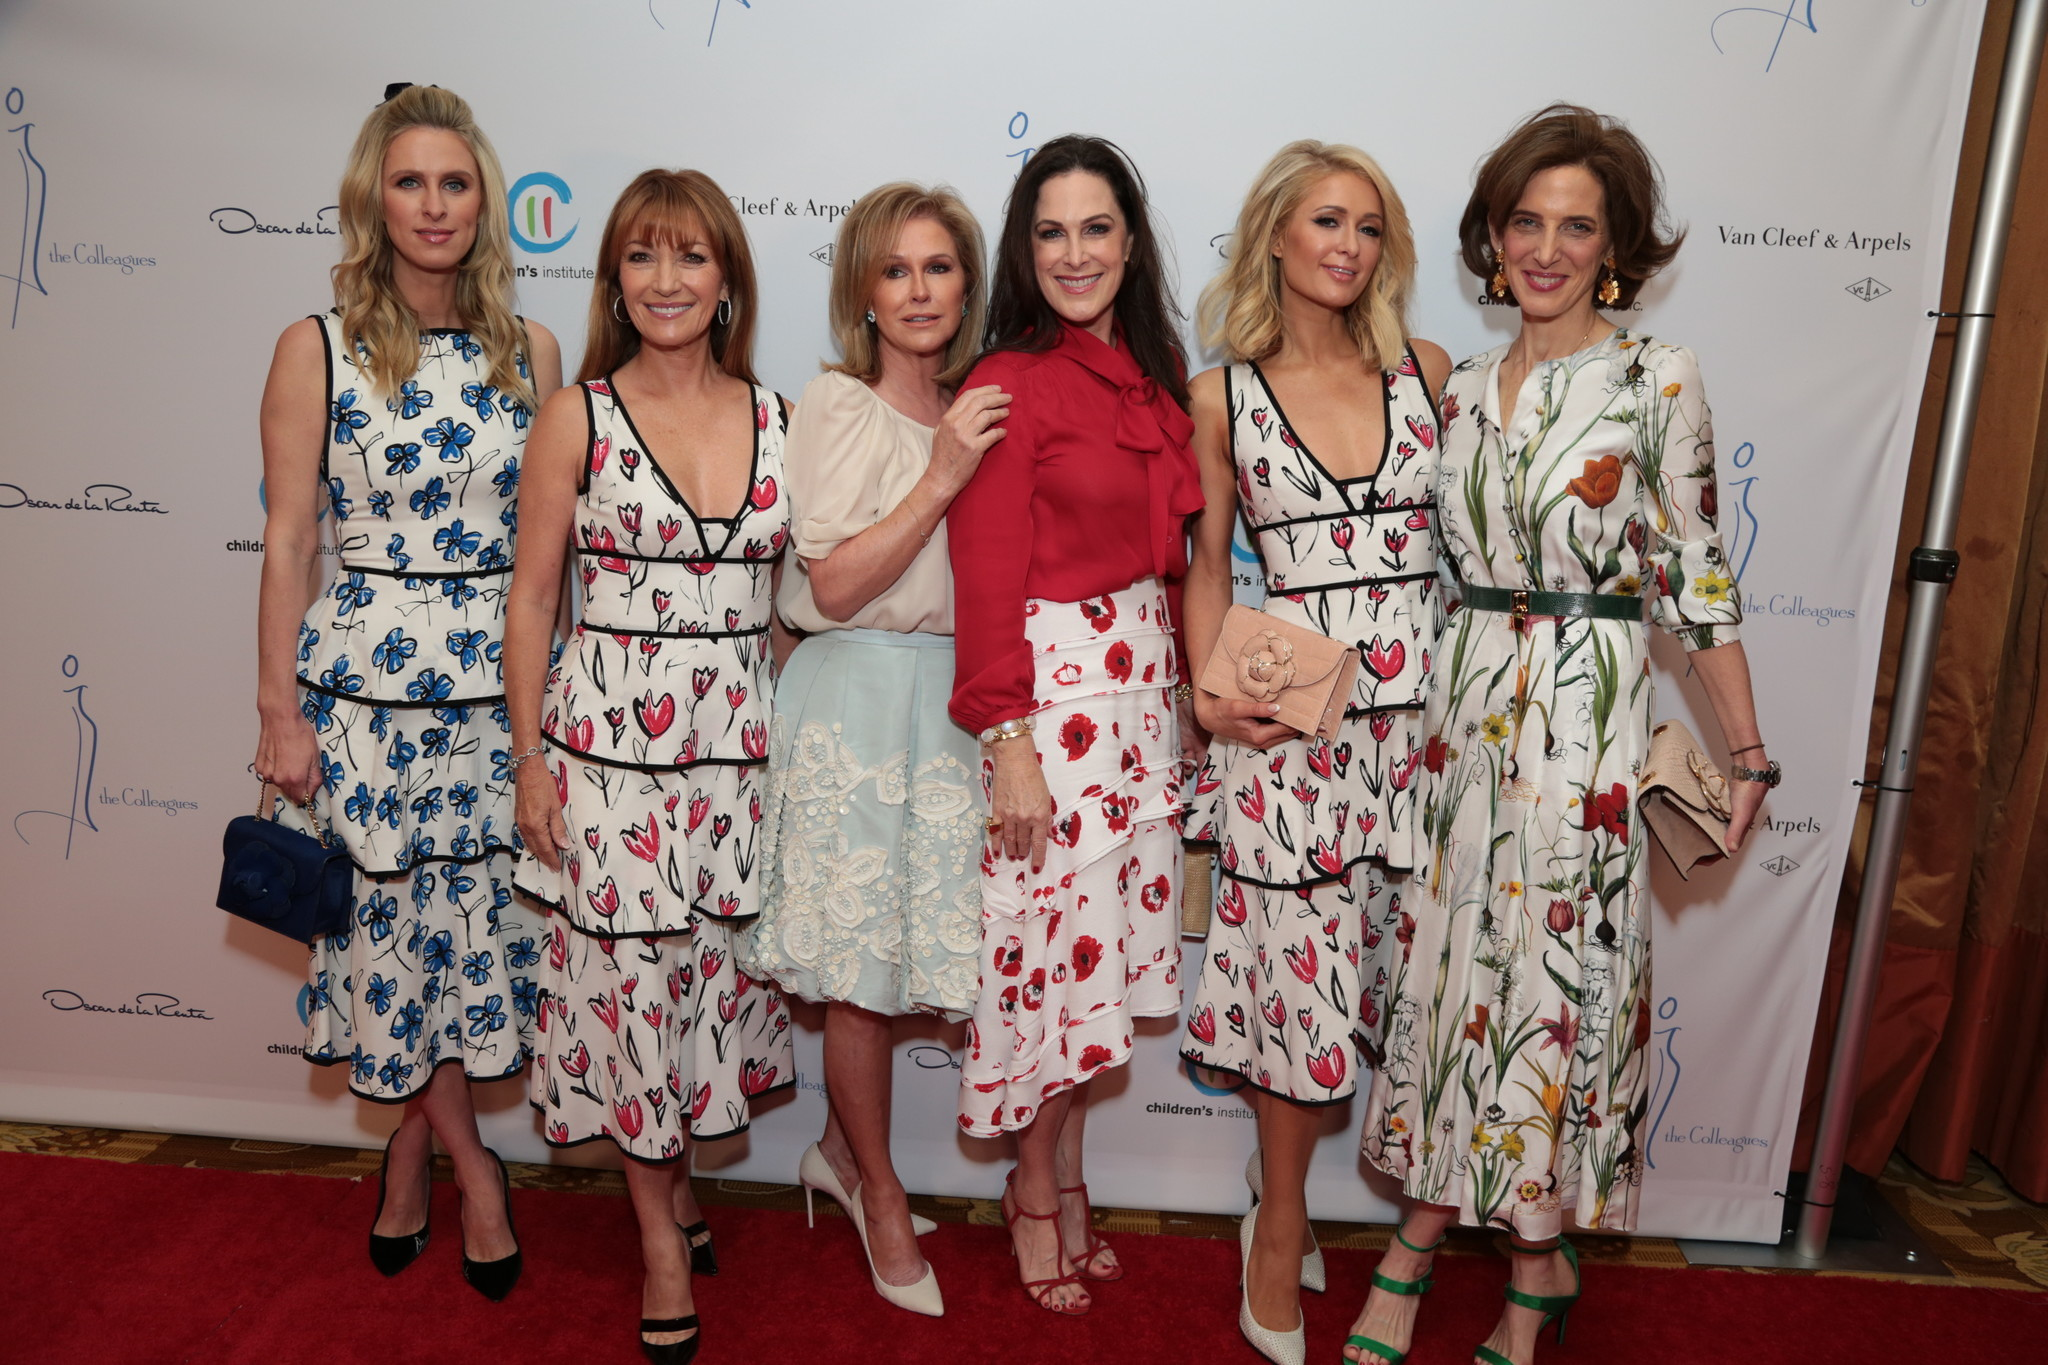 Nicky Hilton Rothschild, Jane Seymour, Kathy Hilton, Bridgette Gless Keller, Paris Hilton, Eliza Reed Bolen